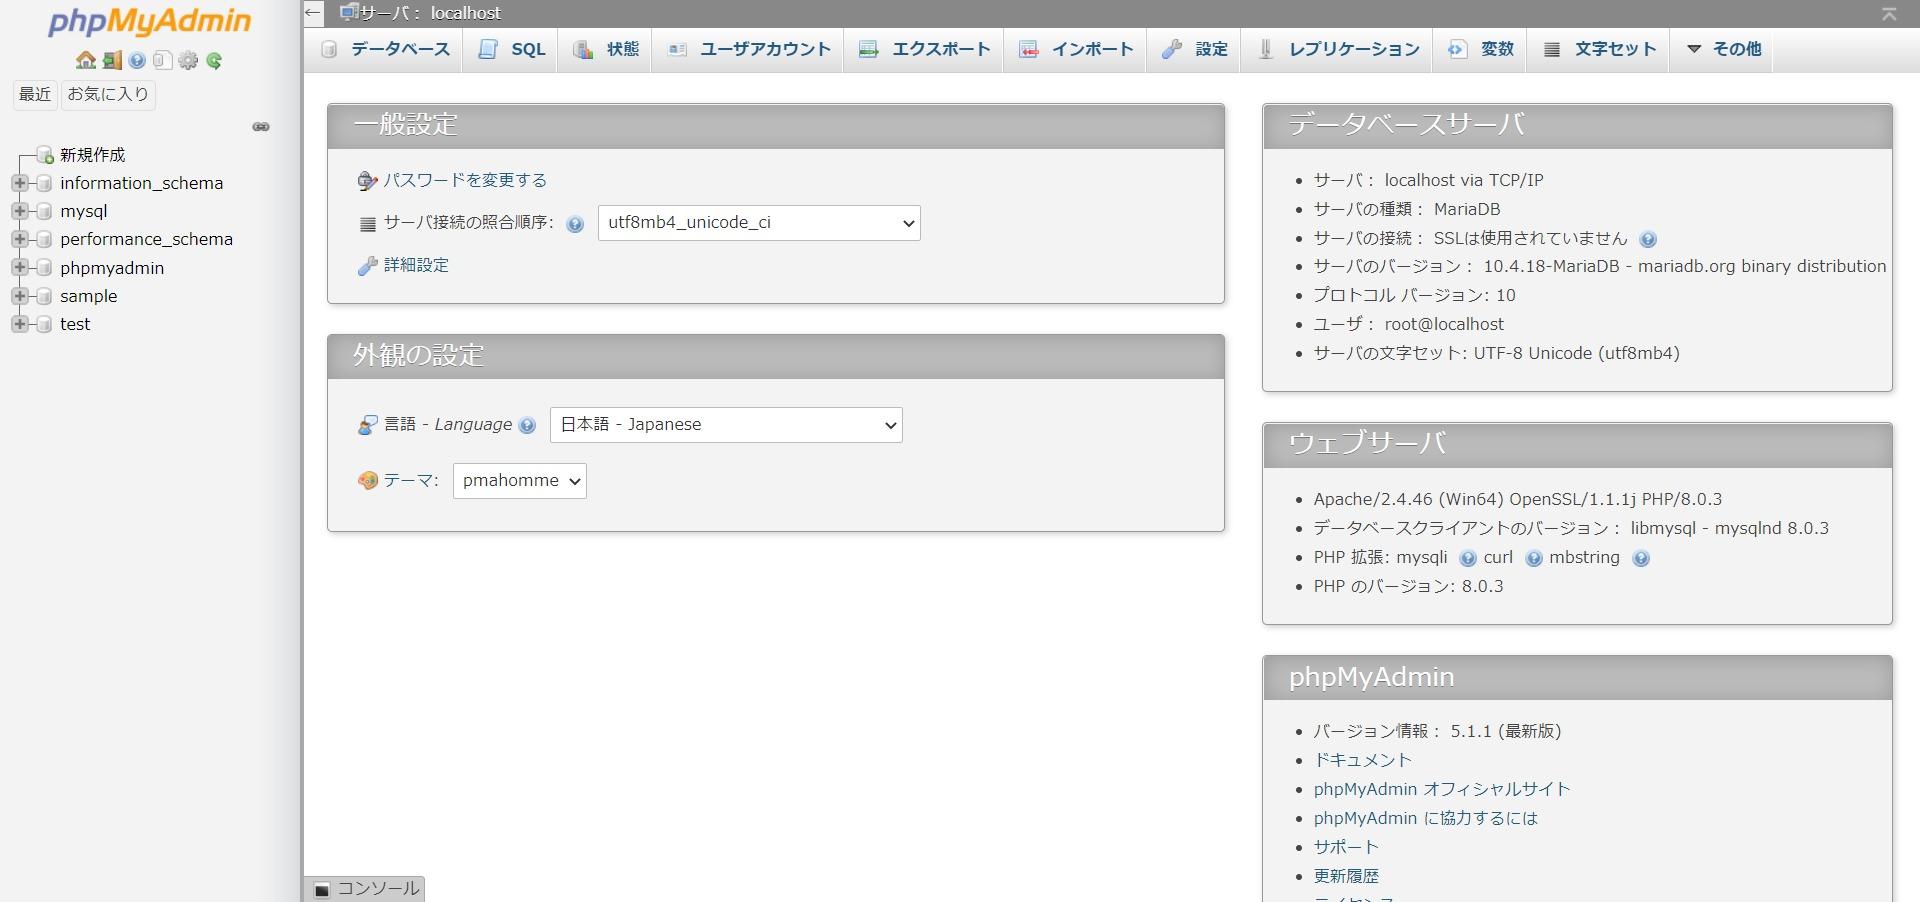 phpMyAdminの画面表示